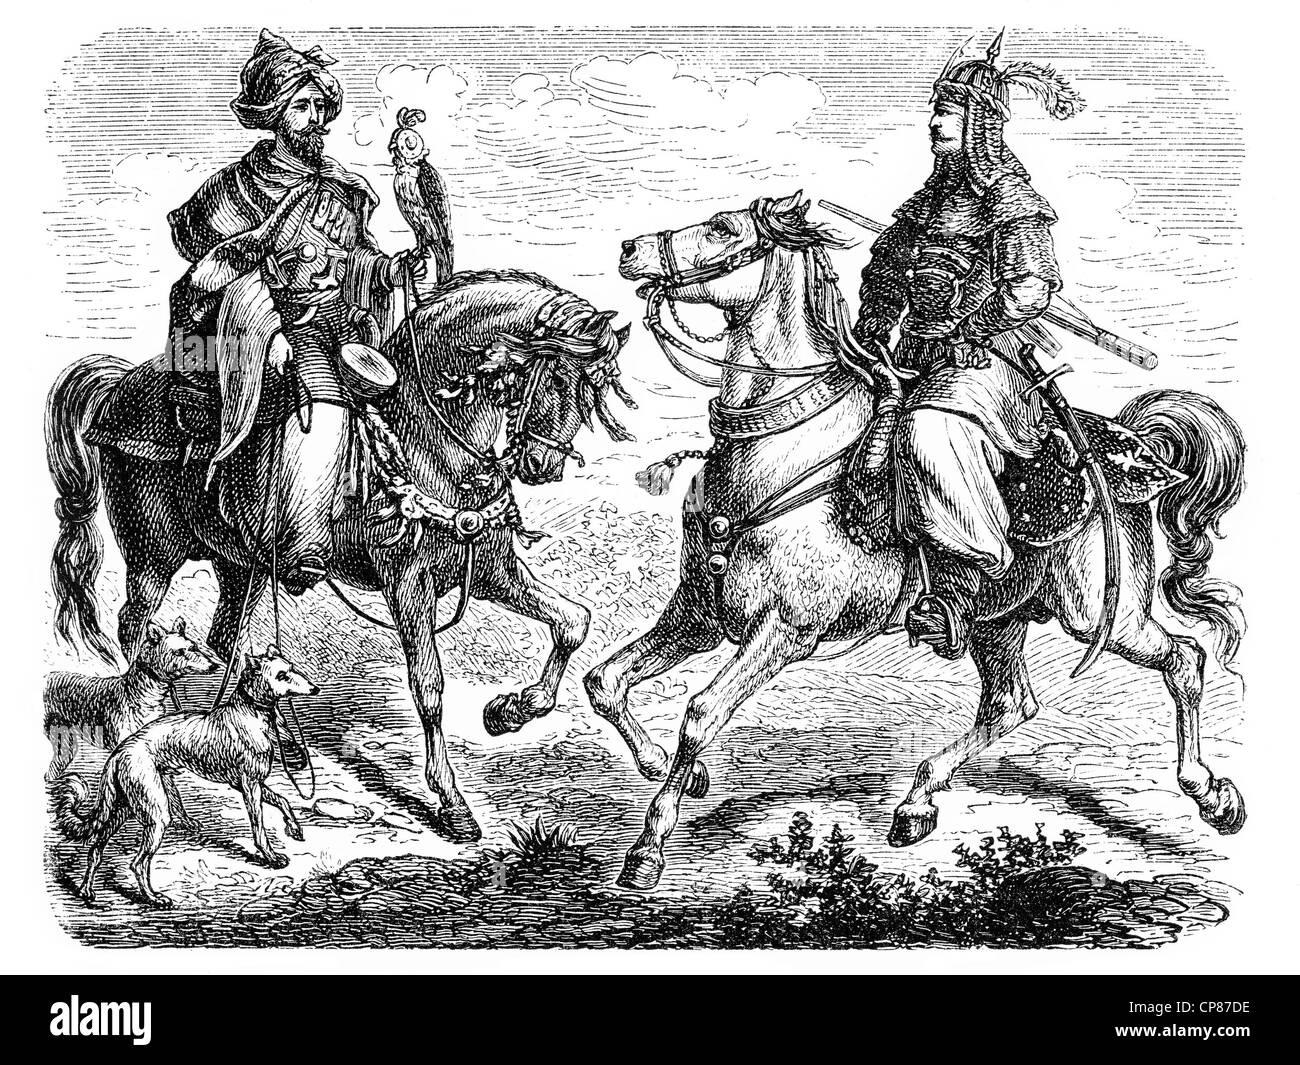 Chefs im Libanon, historische Gravuren, 19. Jahrhundert Häuptlinge Im Libanon, Historischer Stich Stockbild